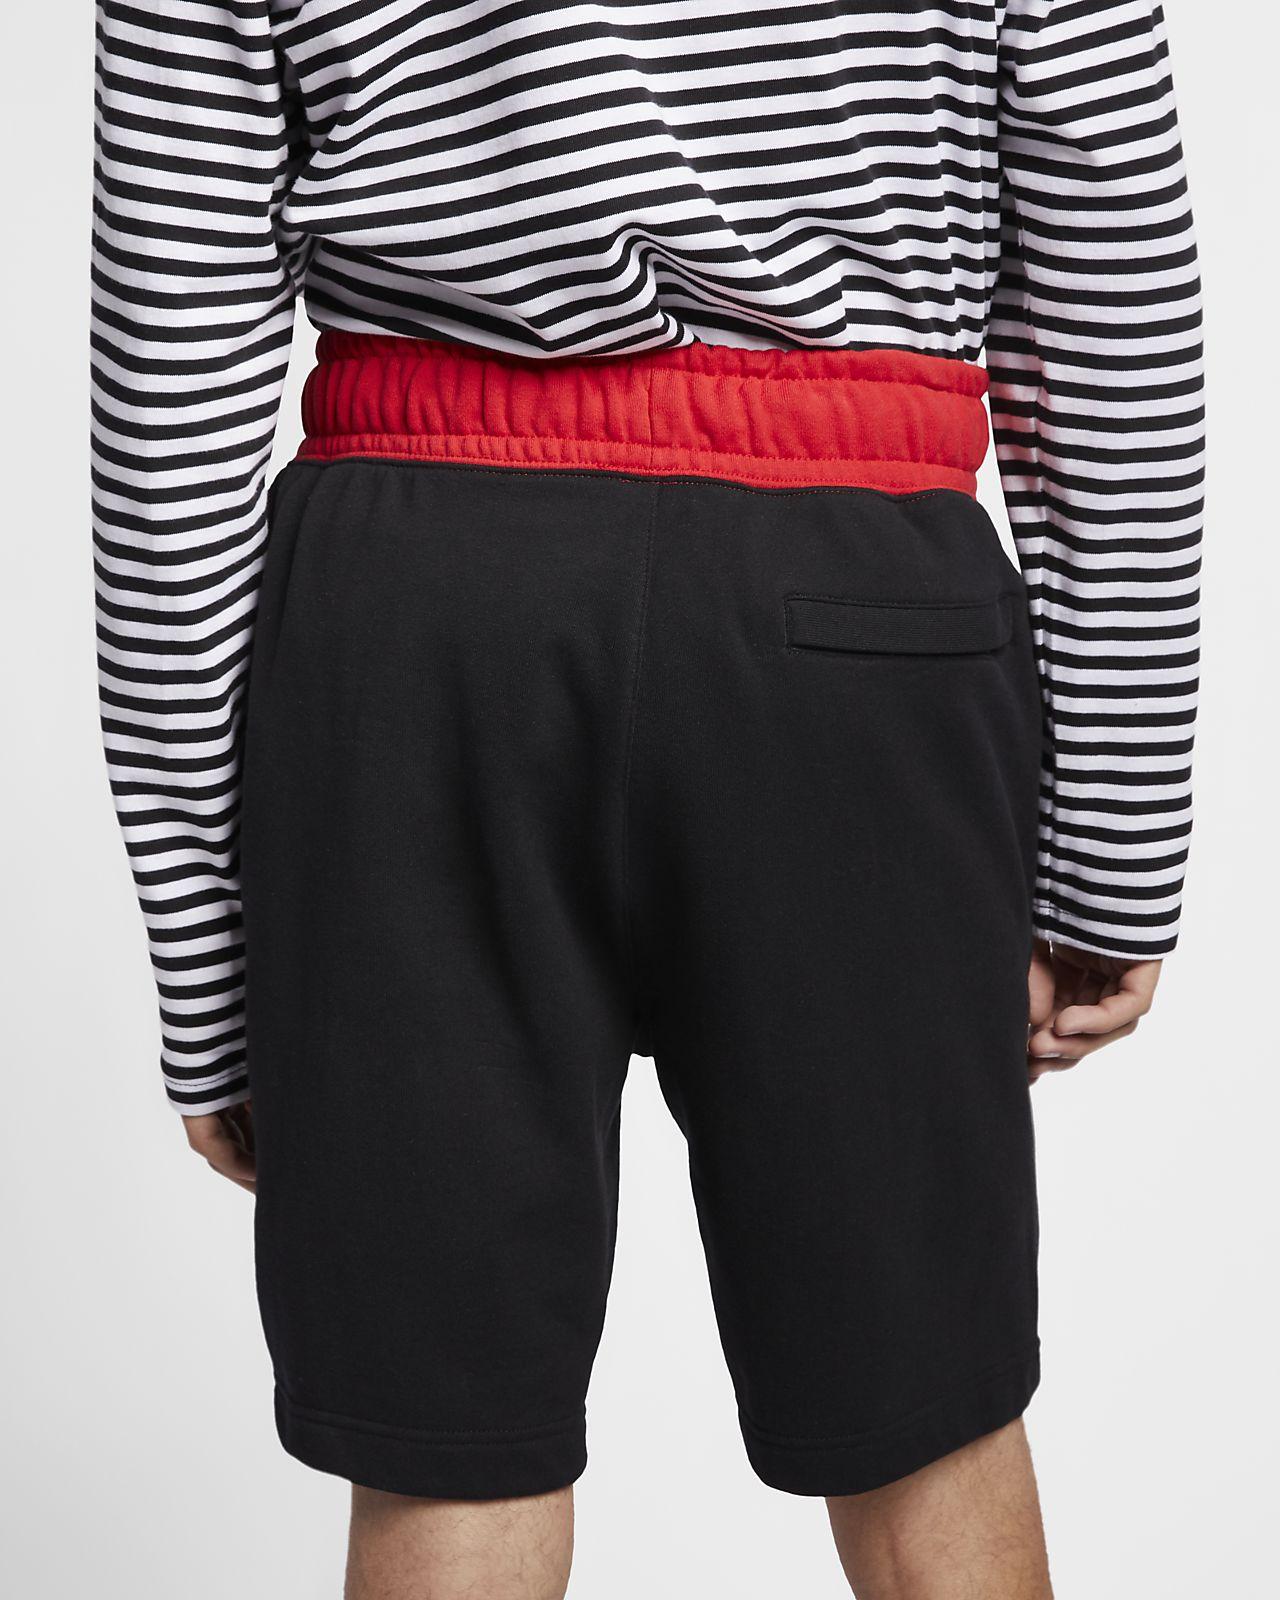 44558290602 Nike Sportswear Men's French Terry Shorts